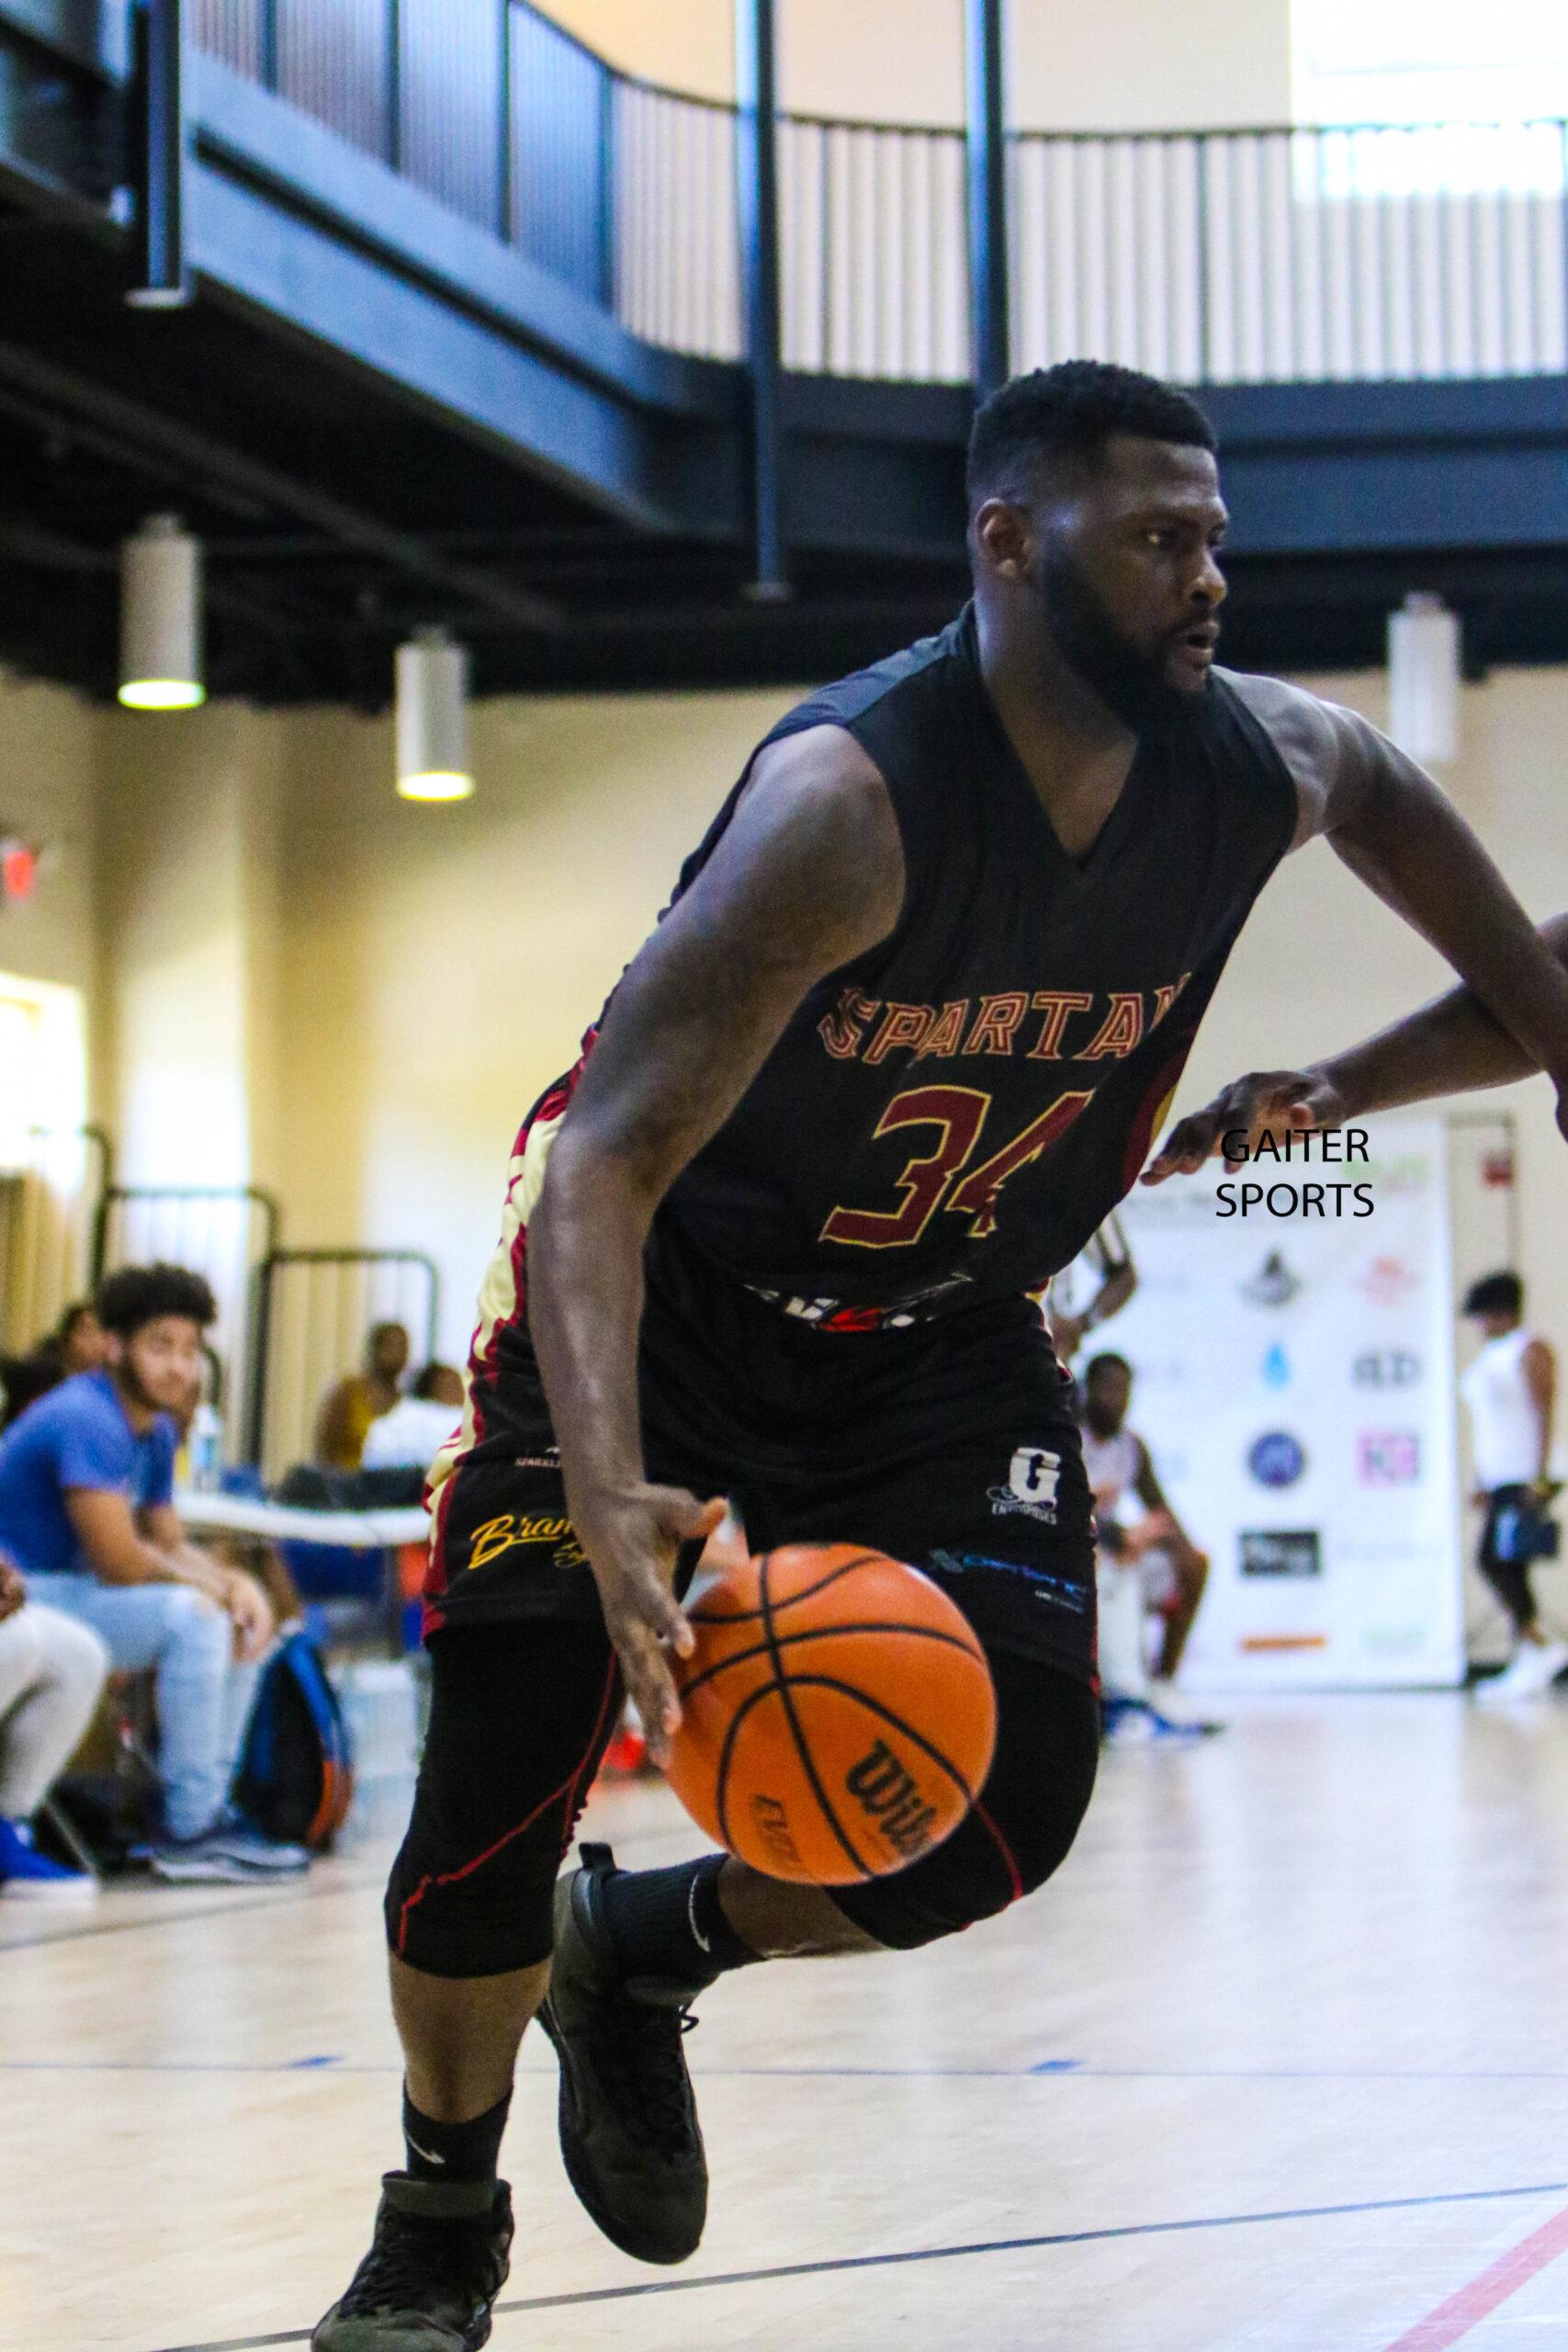 2019 Celebrity Basketball Game Georgia Spartans 115